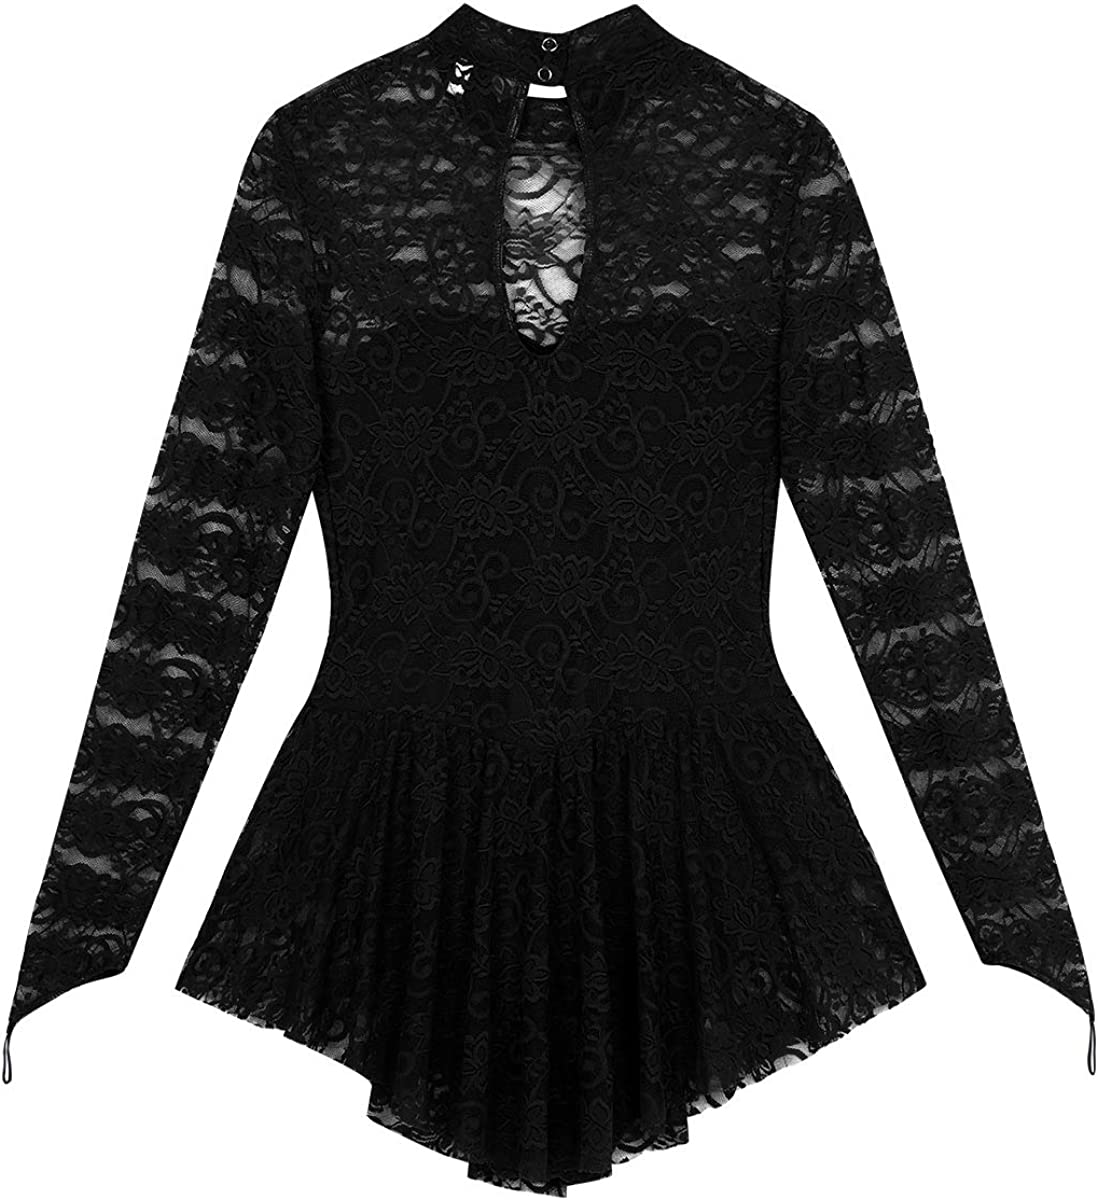 dPois Womens Adult Long Sleeve Lace Leotard Ballet Dance Gymnastics Ice Skating Dress